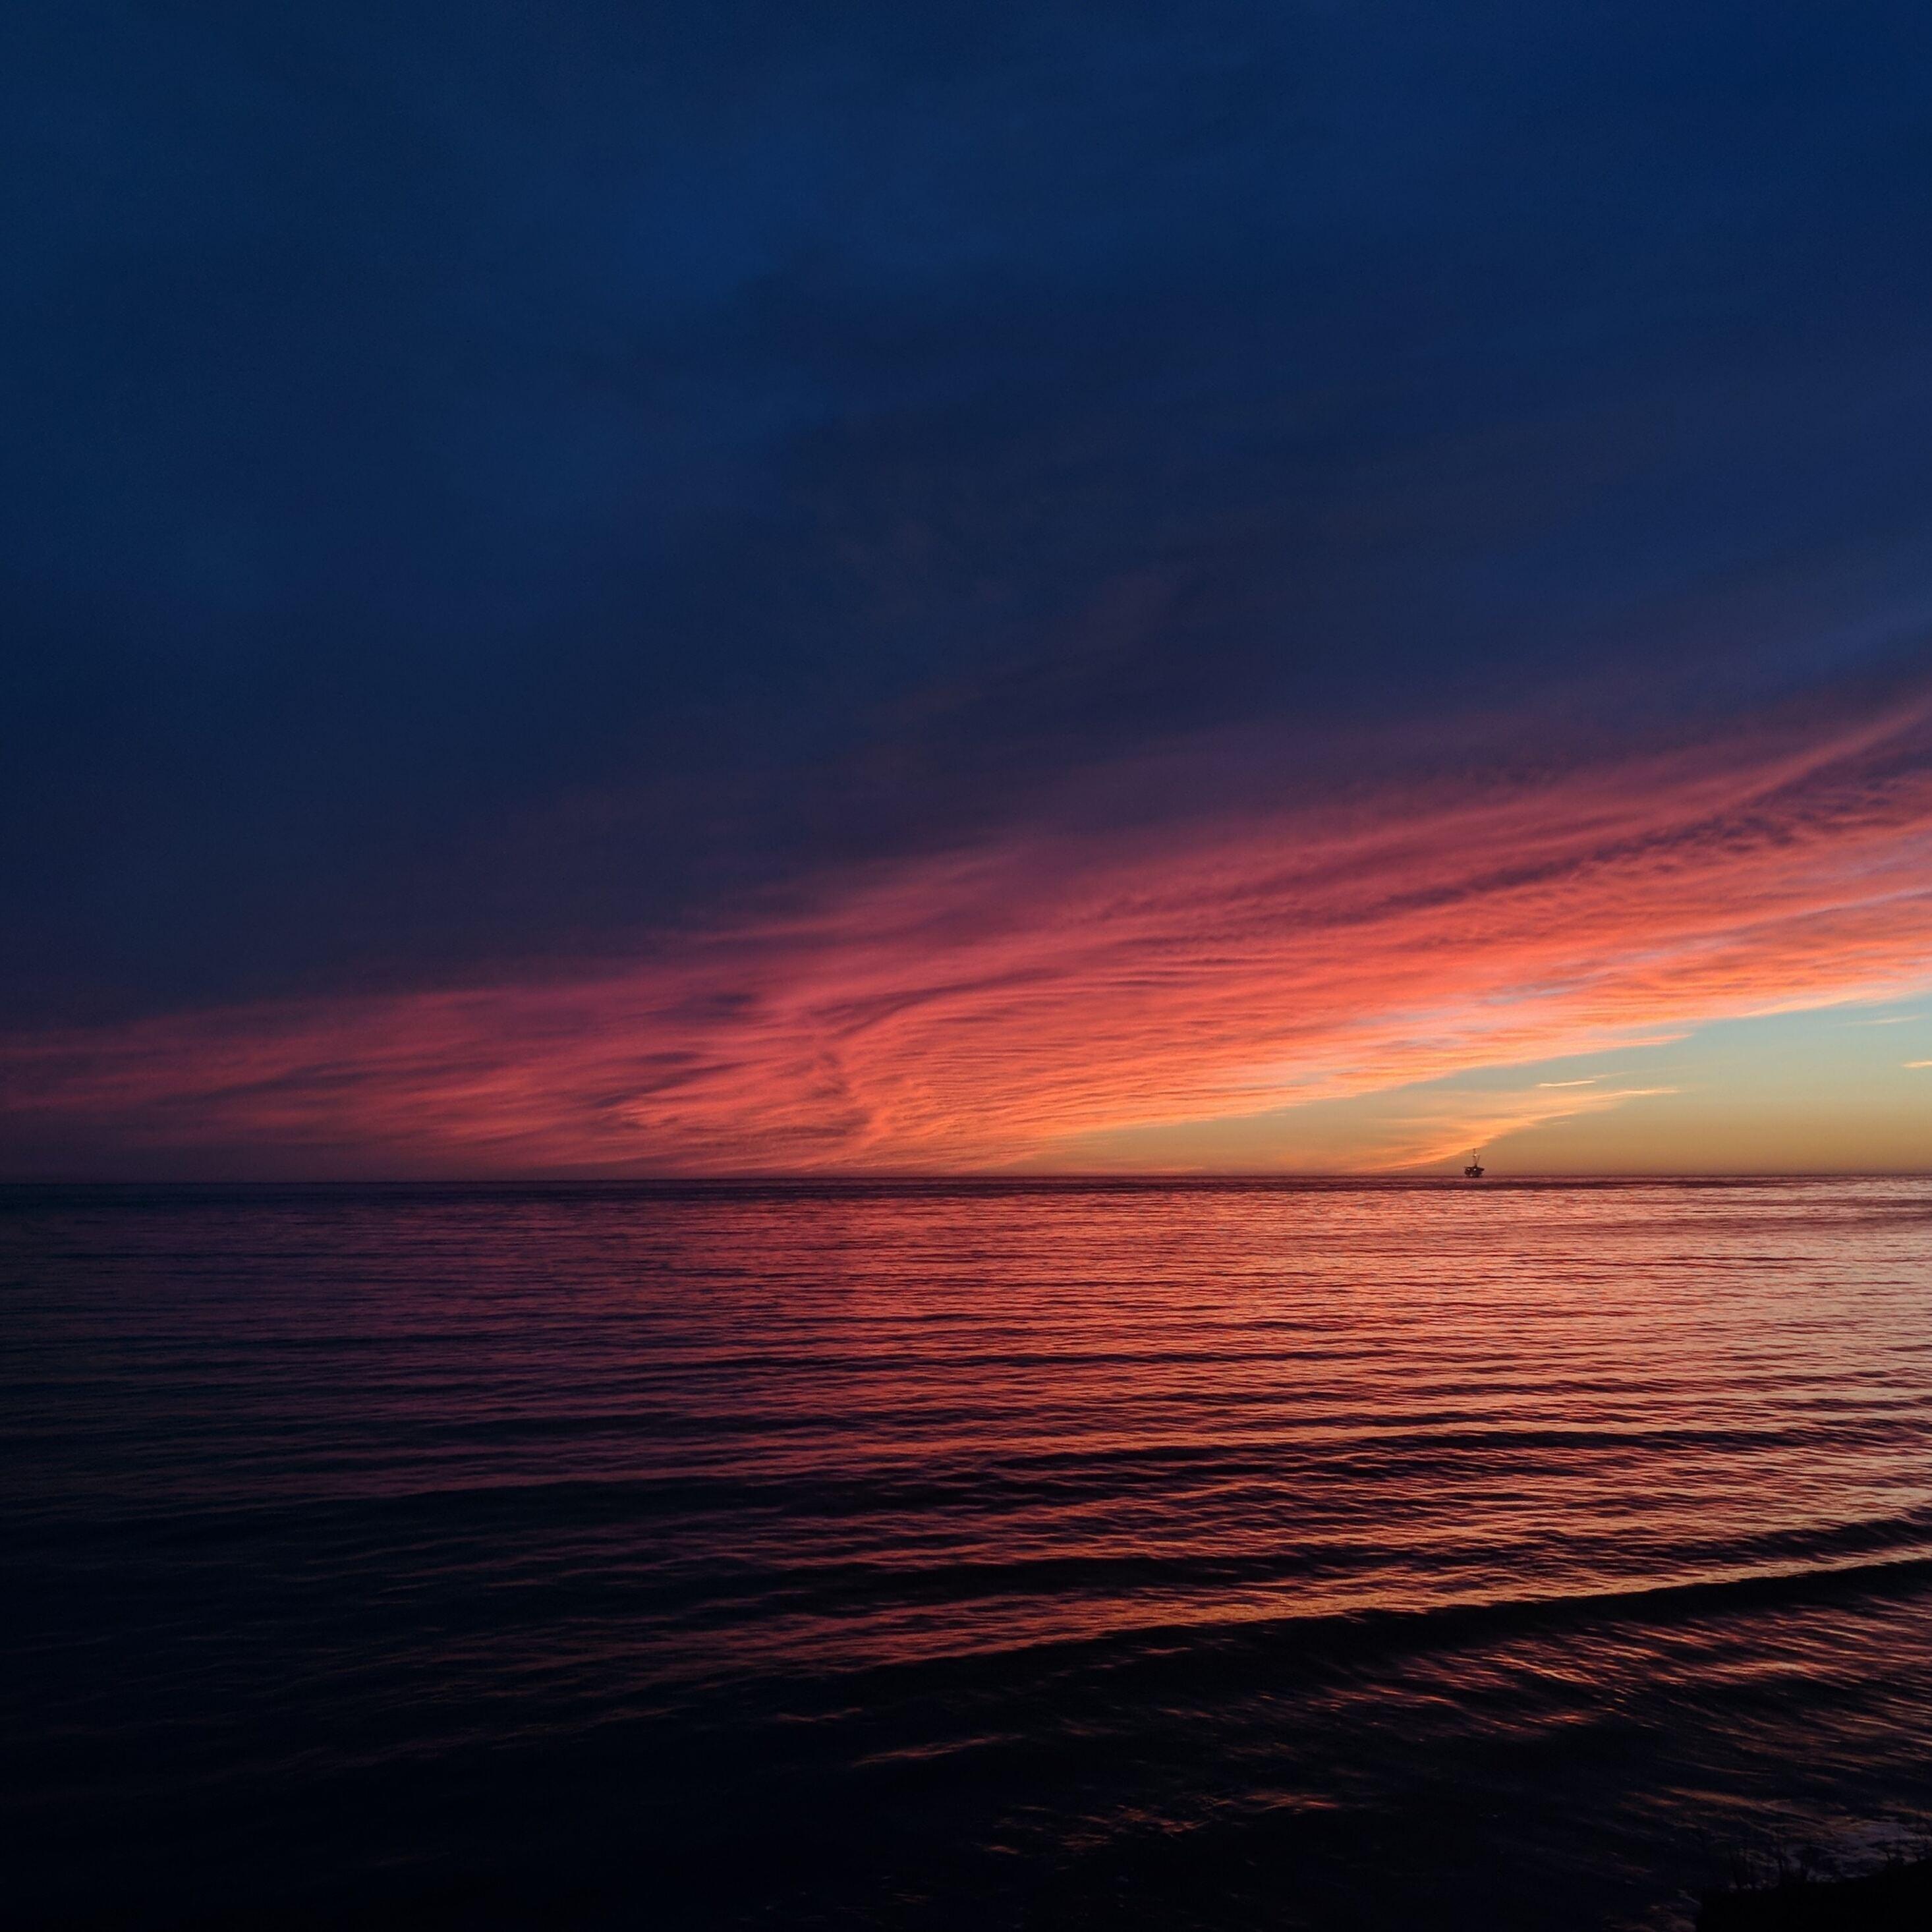 Hd Ocean Wallpaper: 2932x2932 Sea Ocean Sunset Reflection Pastel Waves Ipad